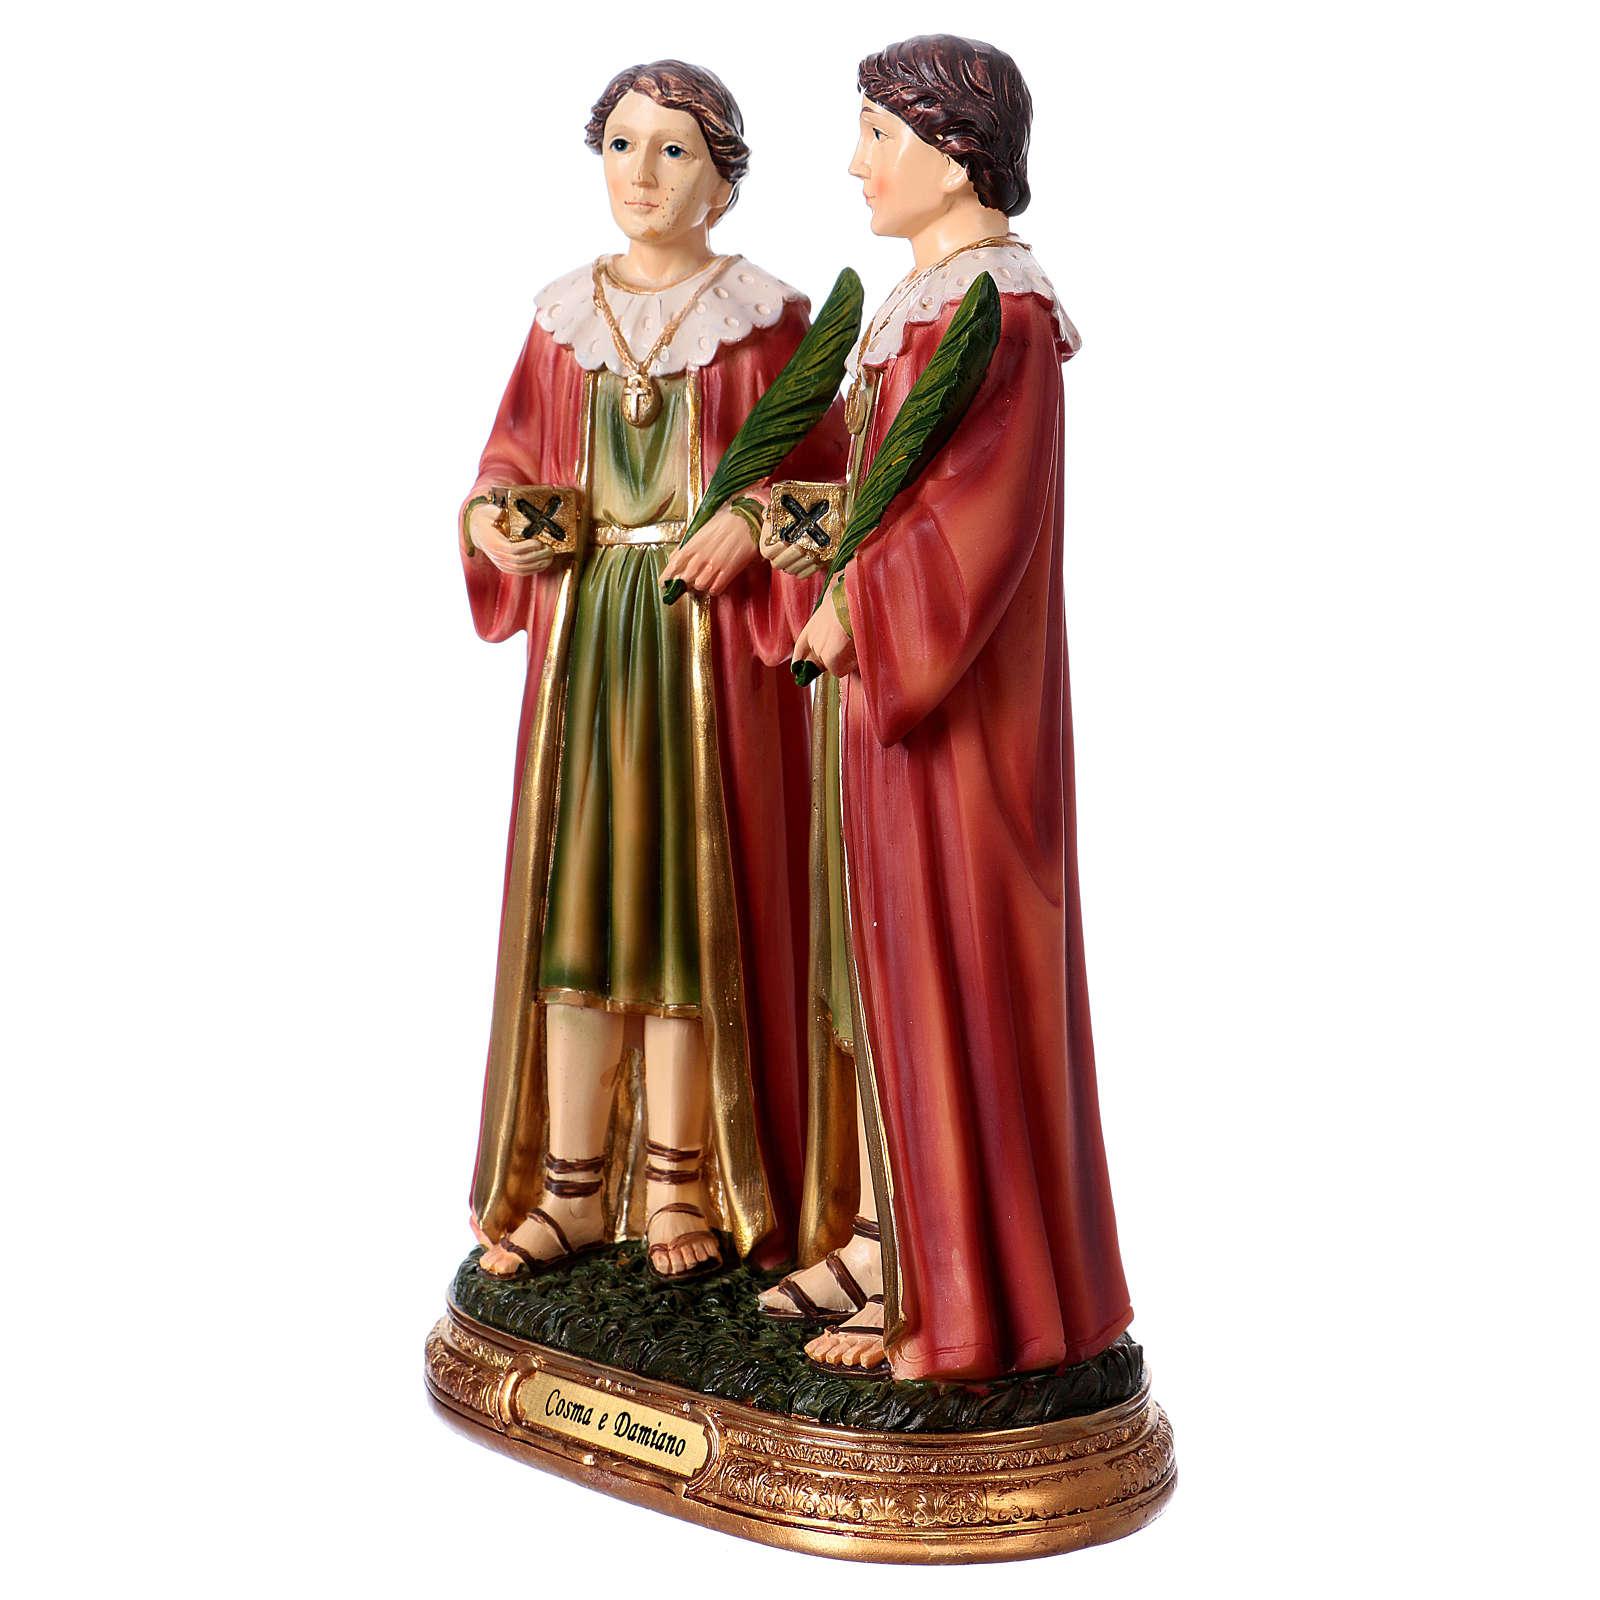 Cosma y Damián estatua 20 cm resina 4